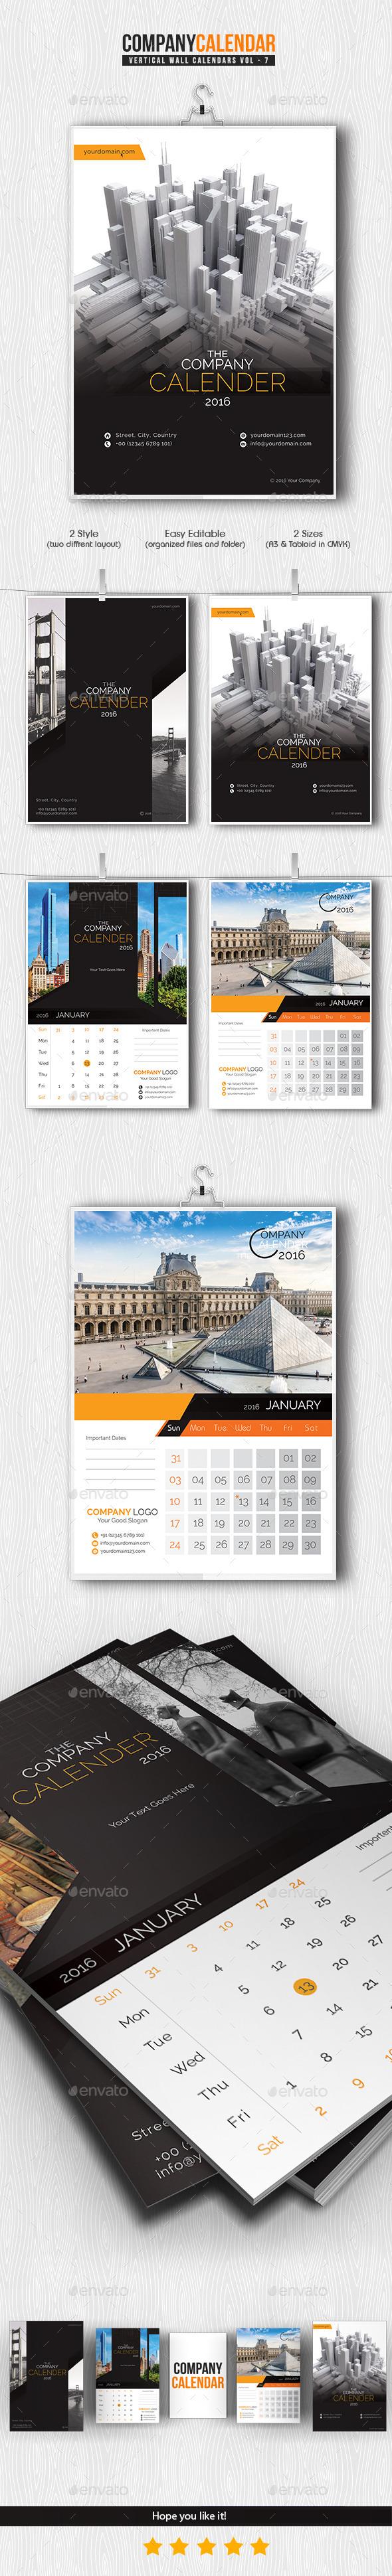 Calendar Pack 2016 - Calendars Stationery